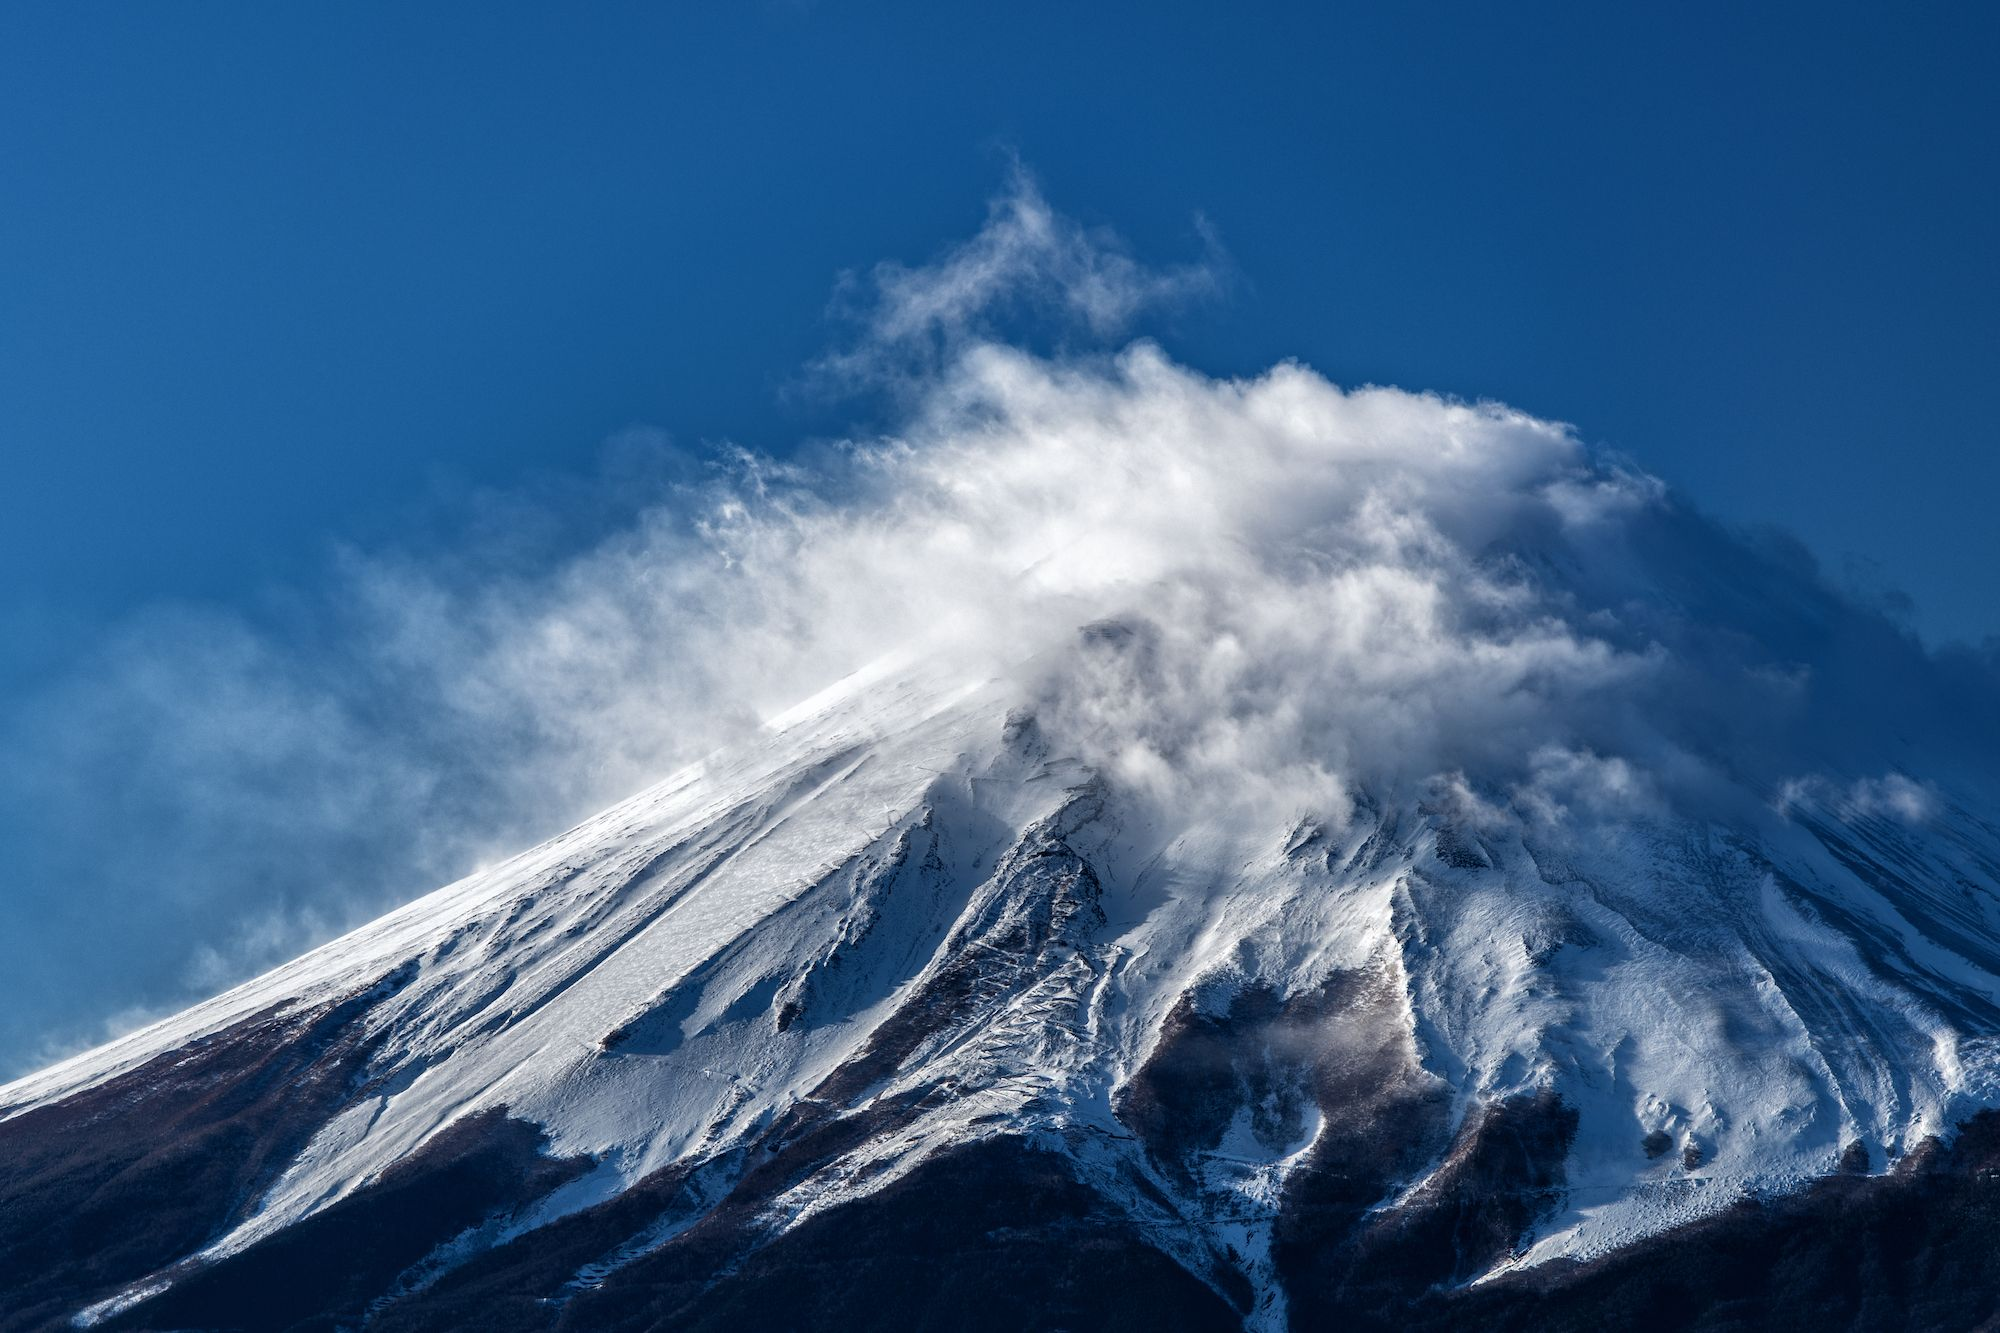 Photo by : Naoya Yoshida . Follow us for amazing posts! #PASHADELIC #FUJIdelic . . #light_nikon #nikond850 #mtfuji #fujiyama #fujisan #photography #photooftheday #nature #naturephotography #landscape #landscapephotography #japan #japan_of_insta #japanphoto #igers #ig_japan #mountain #mountains #mountainphotography #富士山 #富士 #山